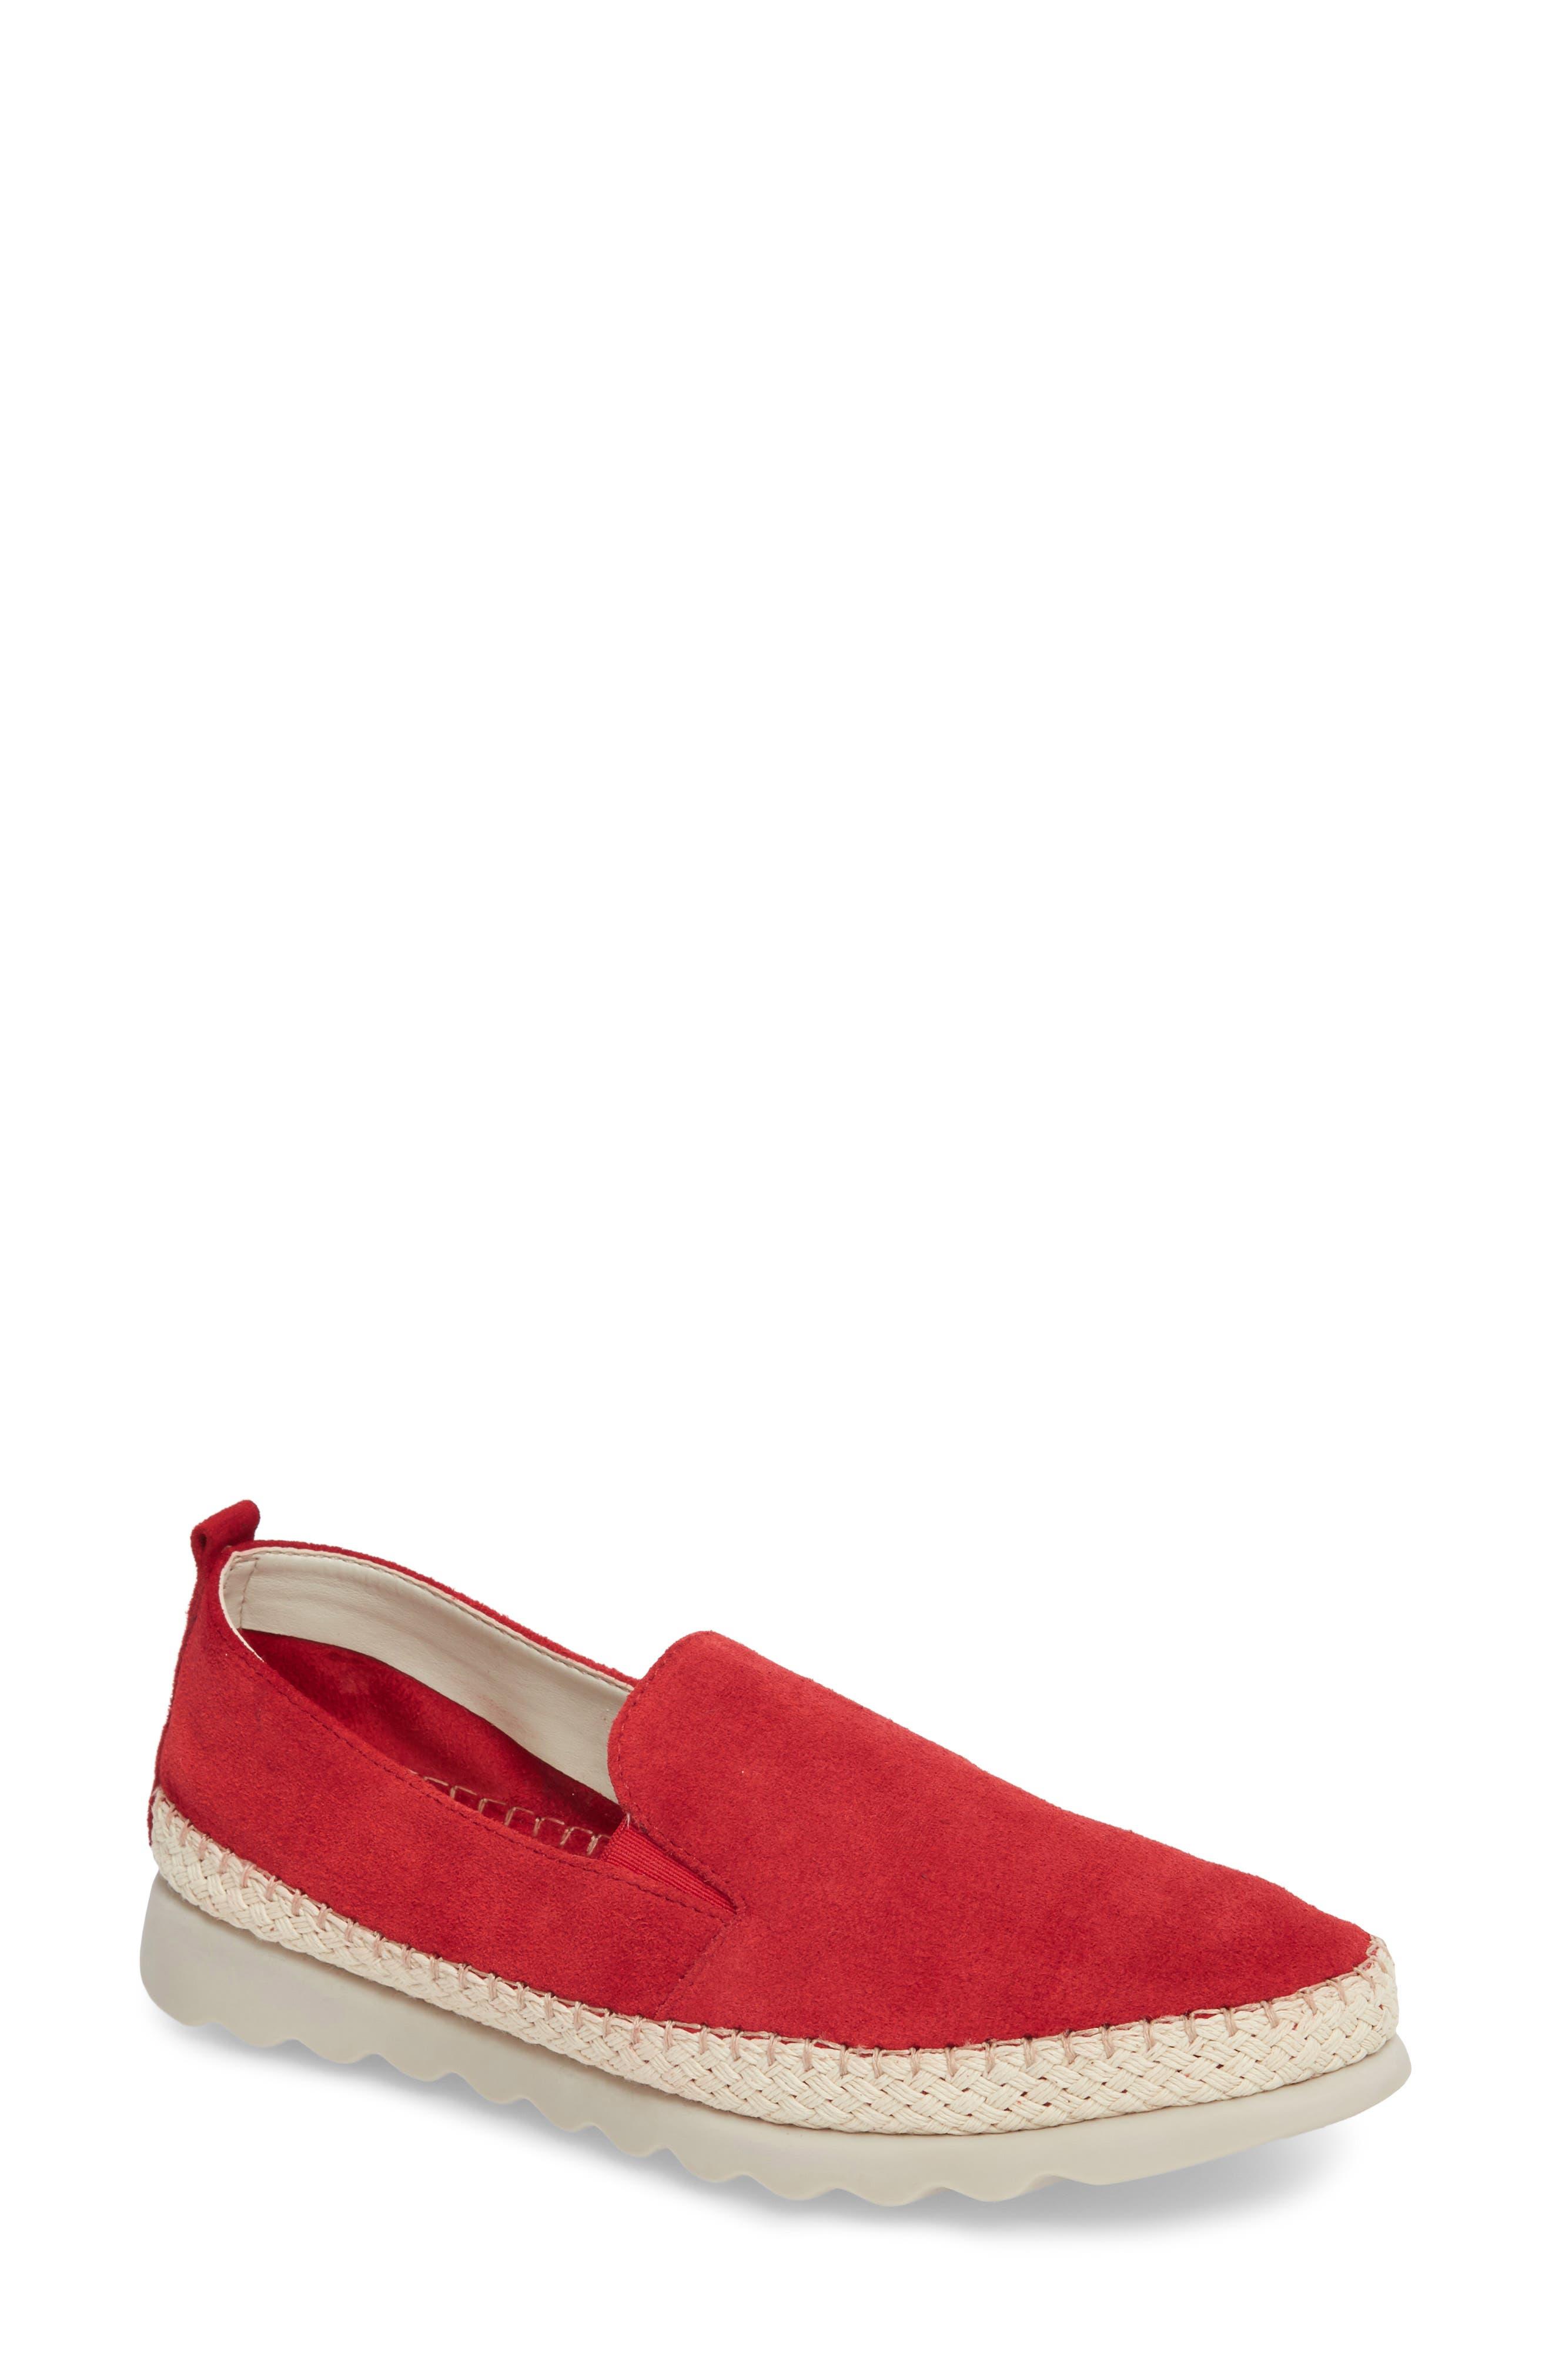 Chappie Slip-On Sneaker,                             Main thumbnail 6, color,